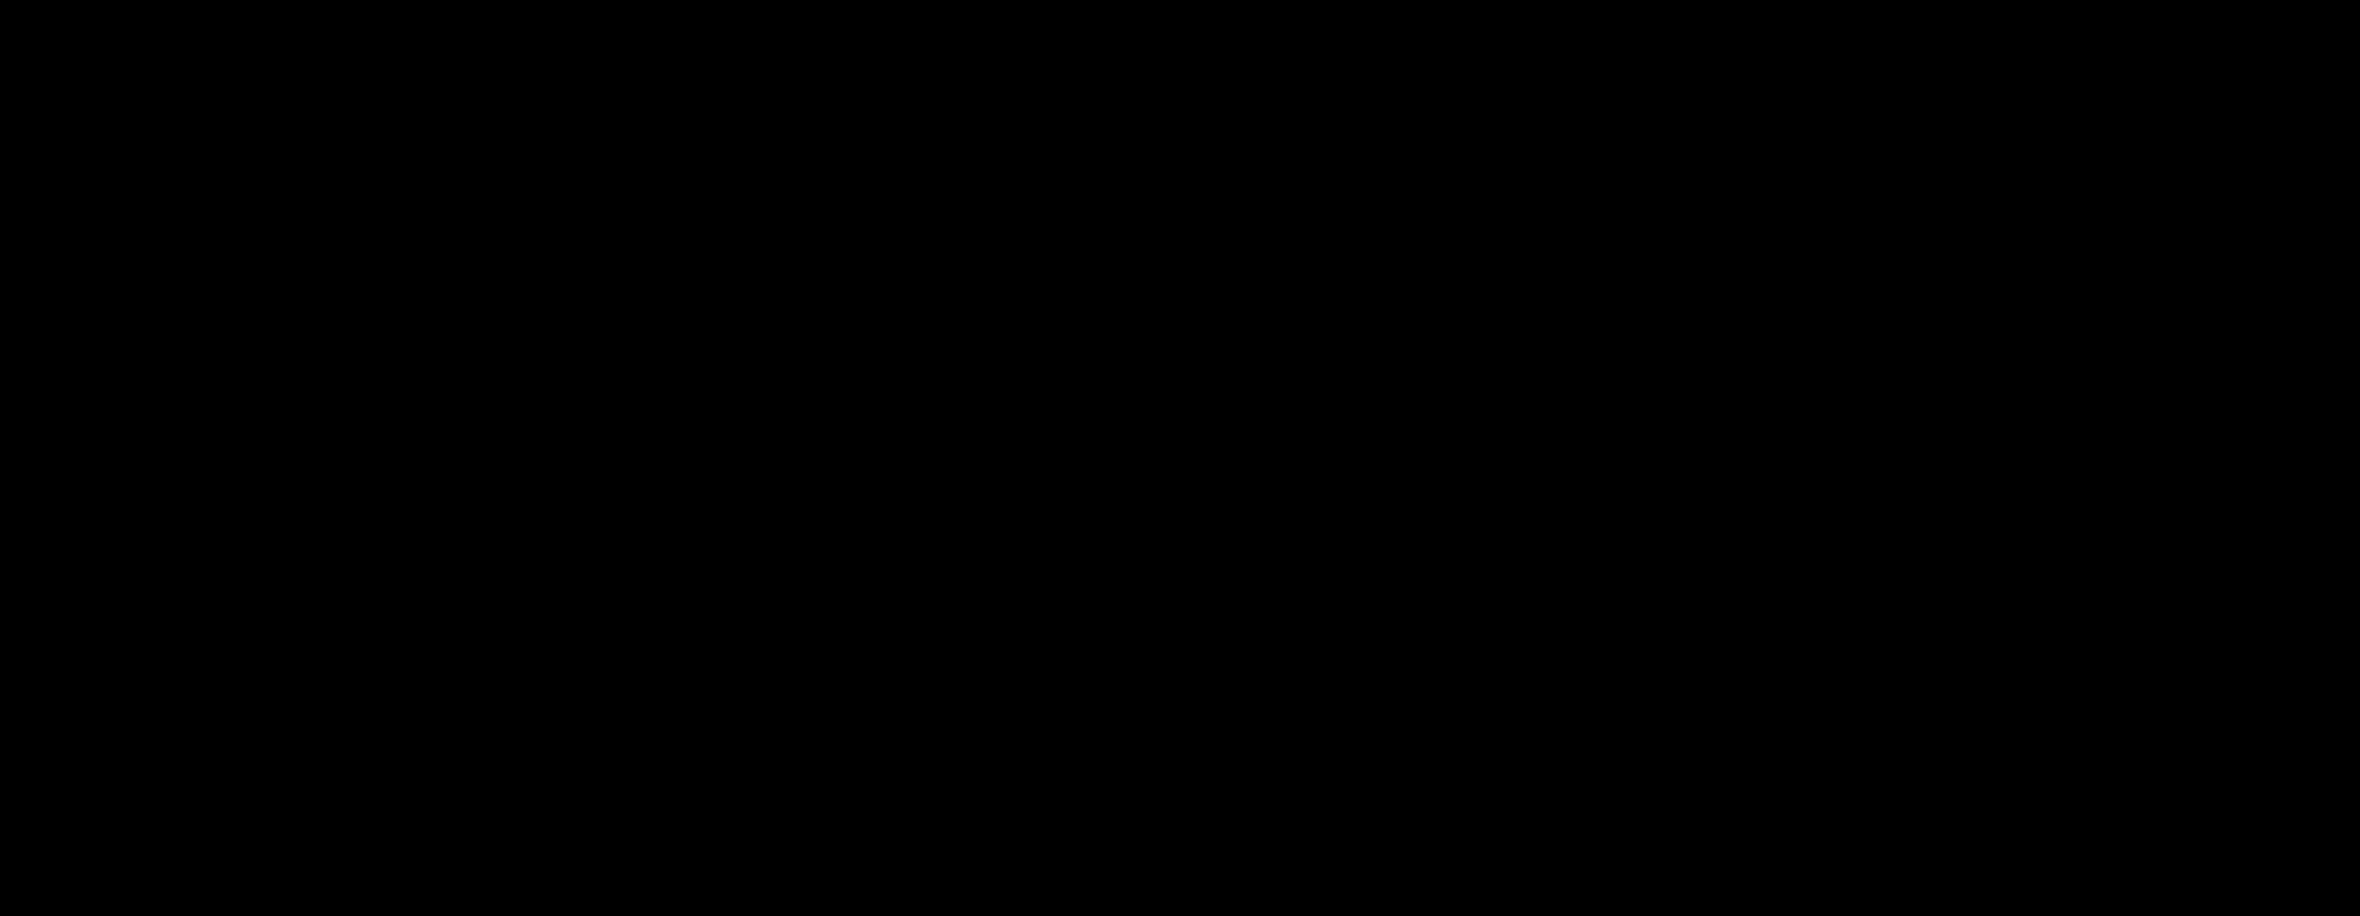 N-(8-Amino-3,6-dioxaoctyl)-7-dimethylaminocoumarin-4-acetamide